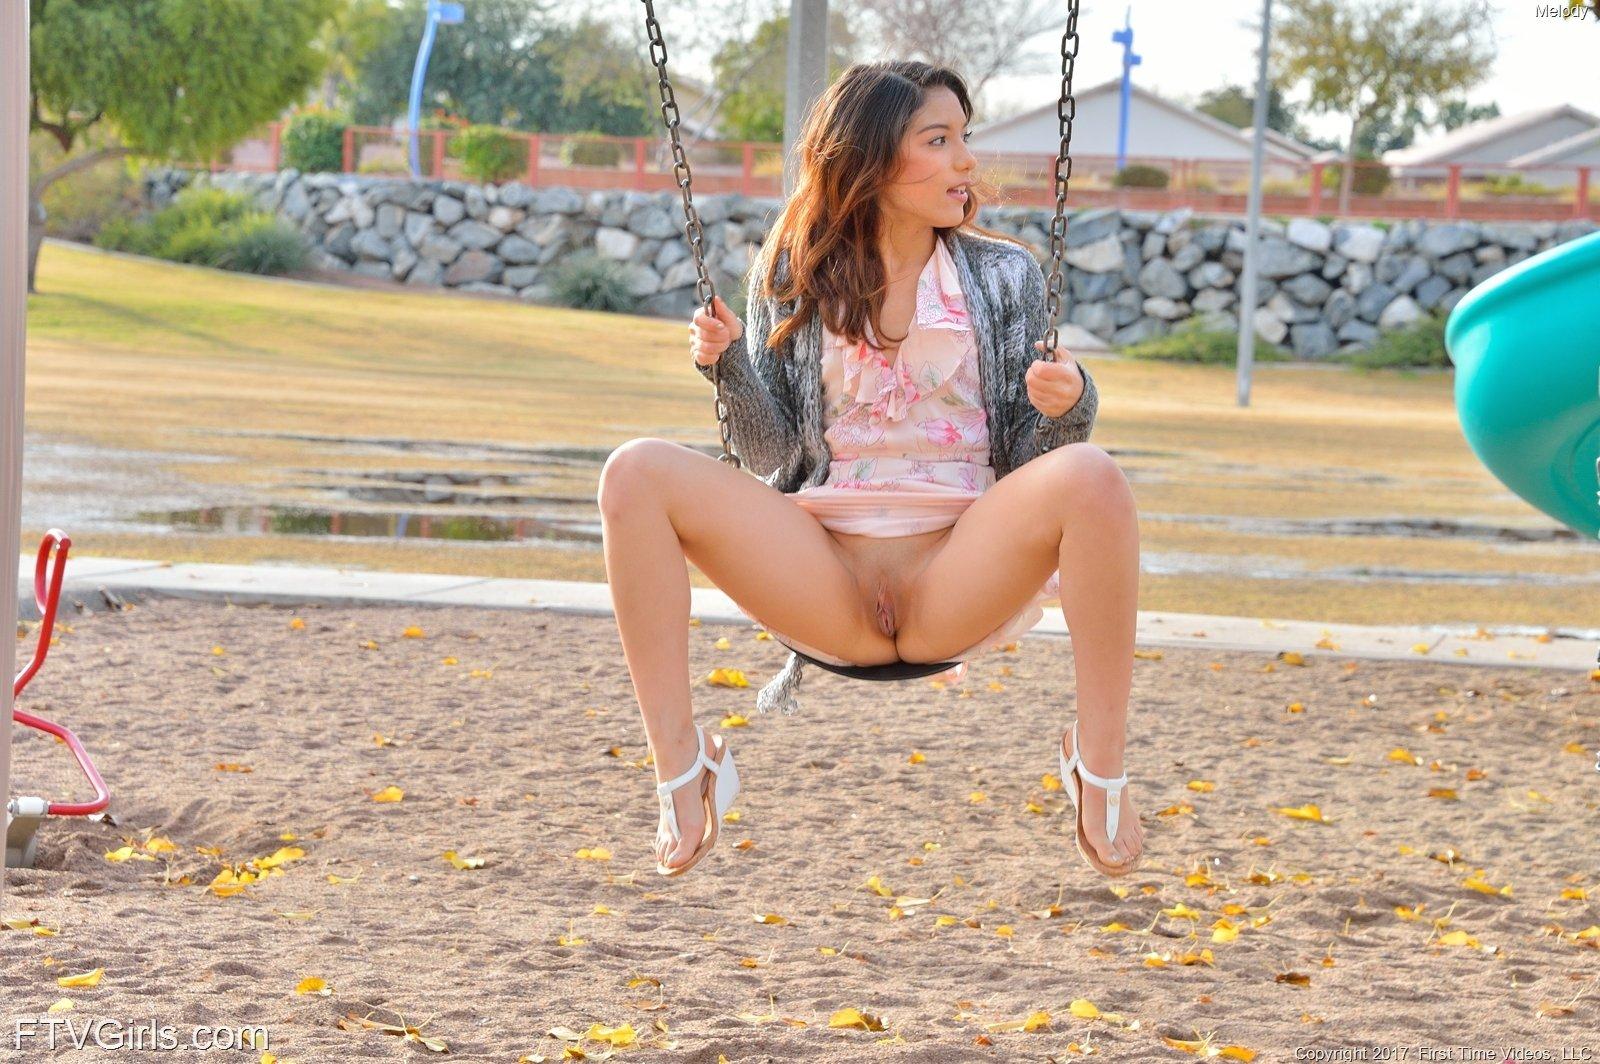 https://cdn.eroticbeauties.net/content/ftvgirls_7532_melody_at-the-playground/full/15.jpg